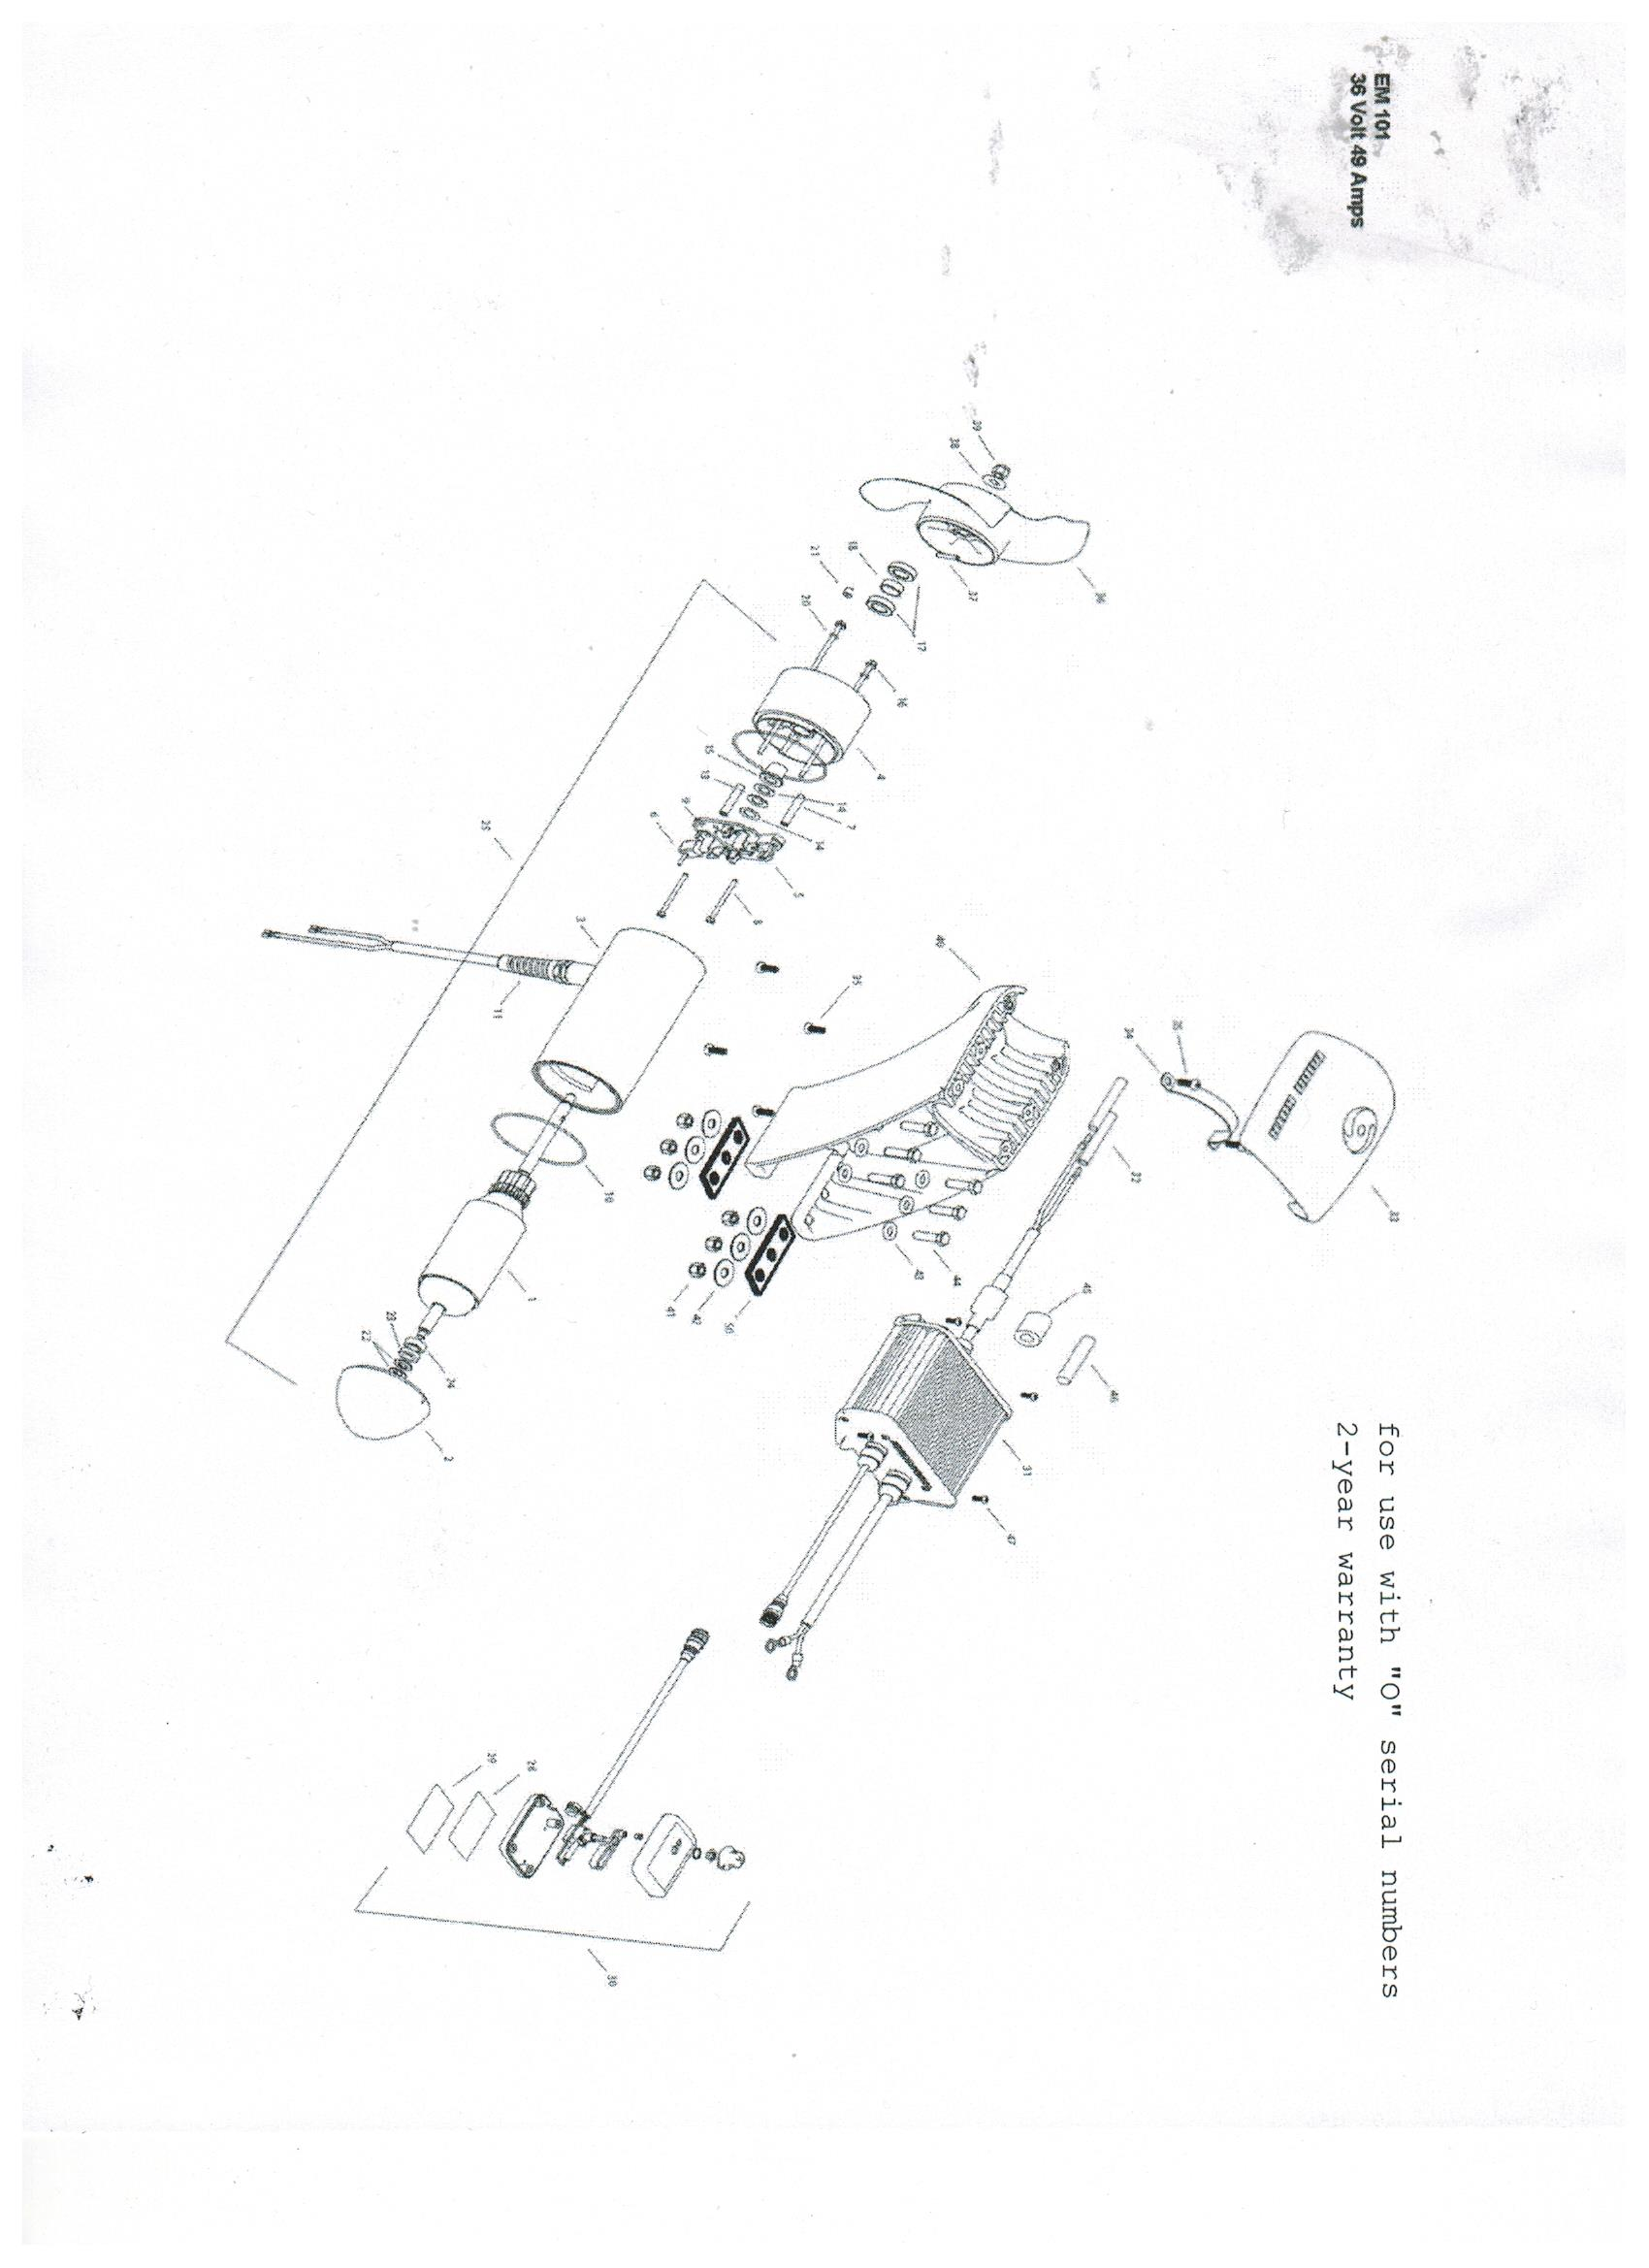 Minn Kota Engine Mount 160 Parts